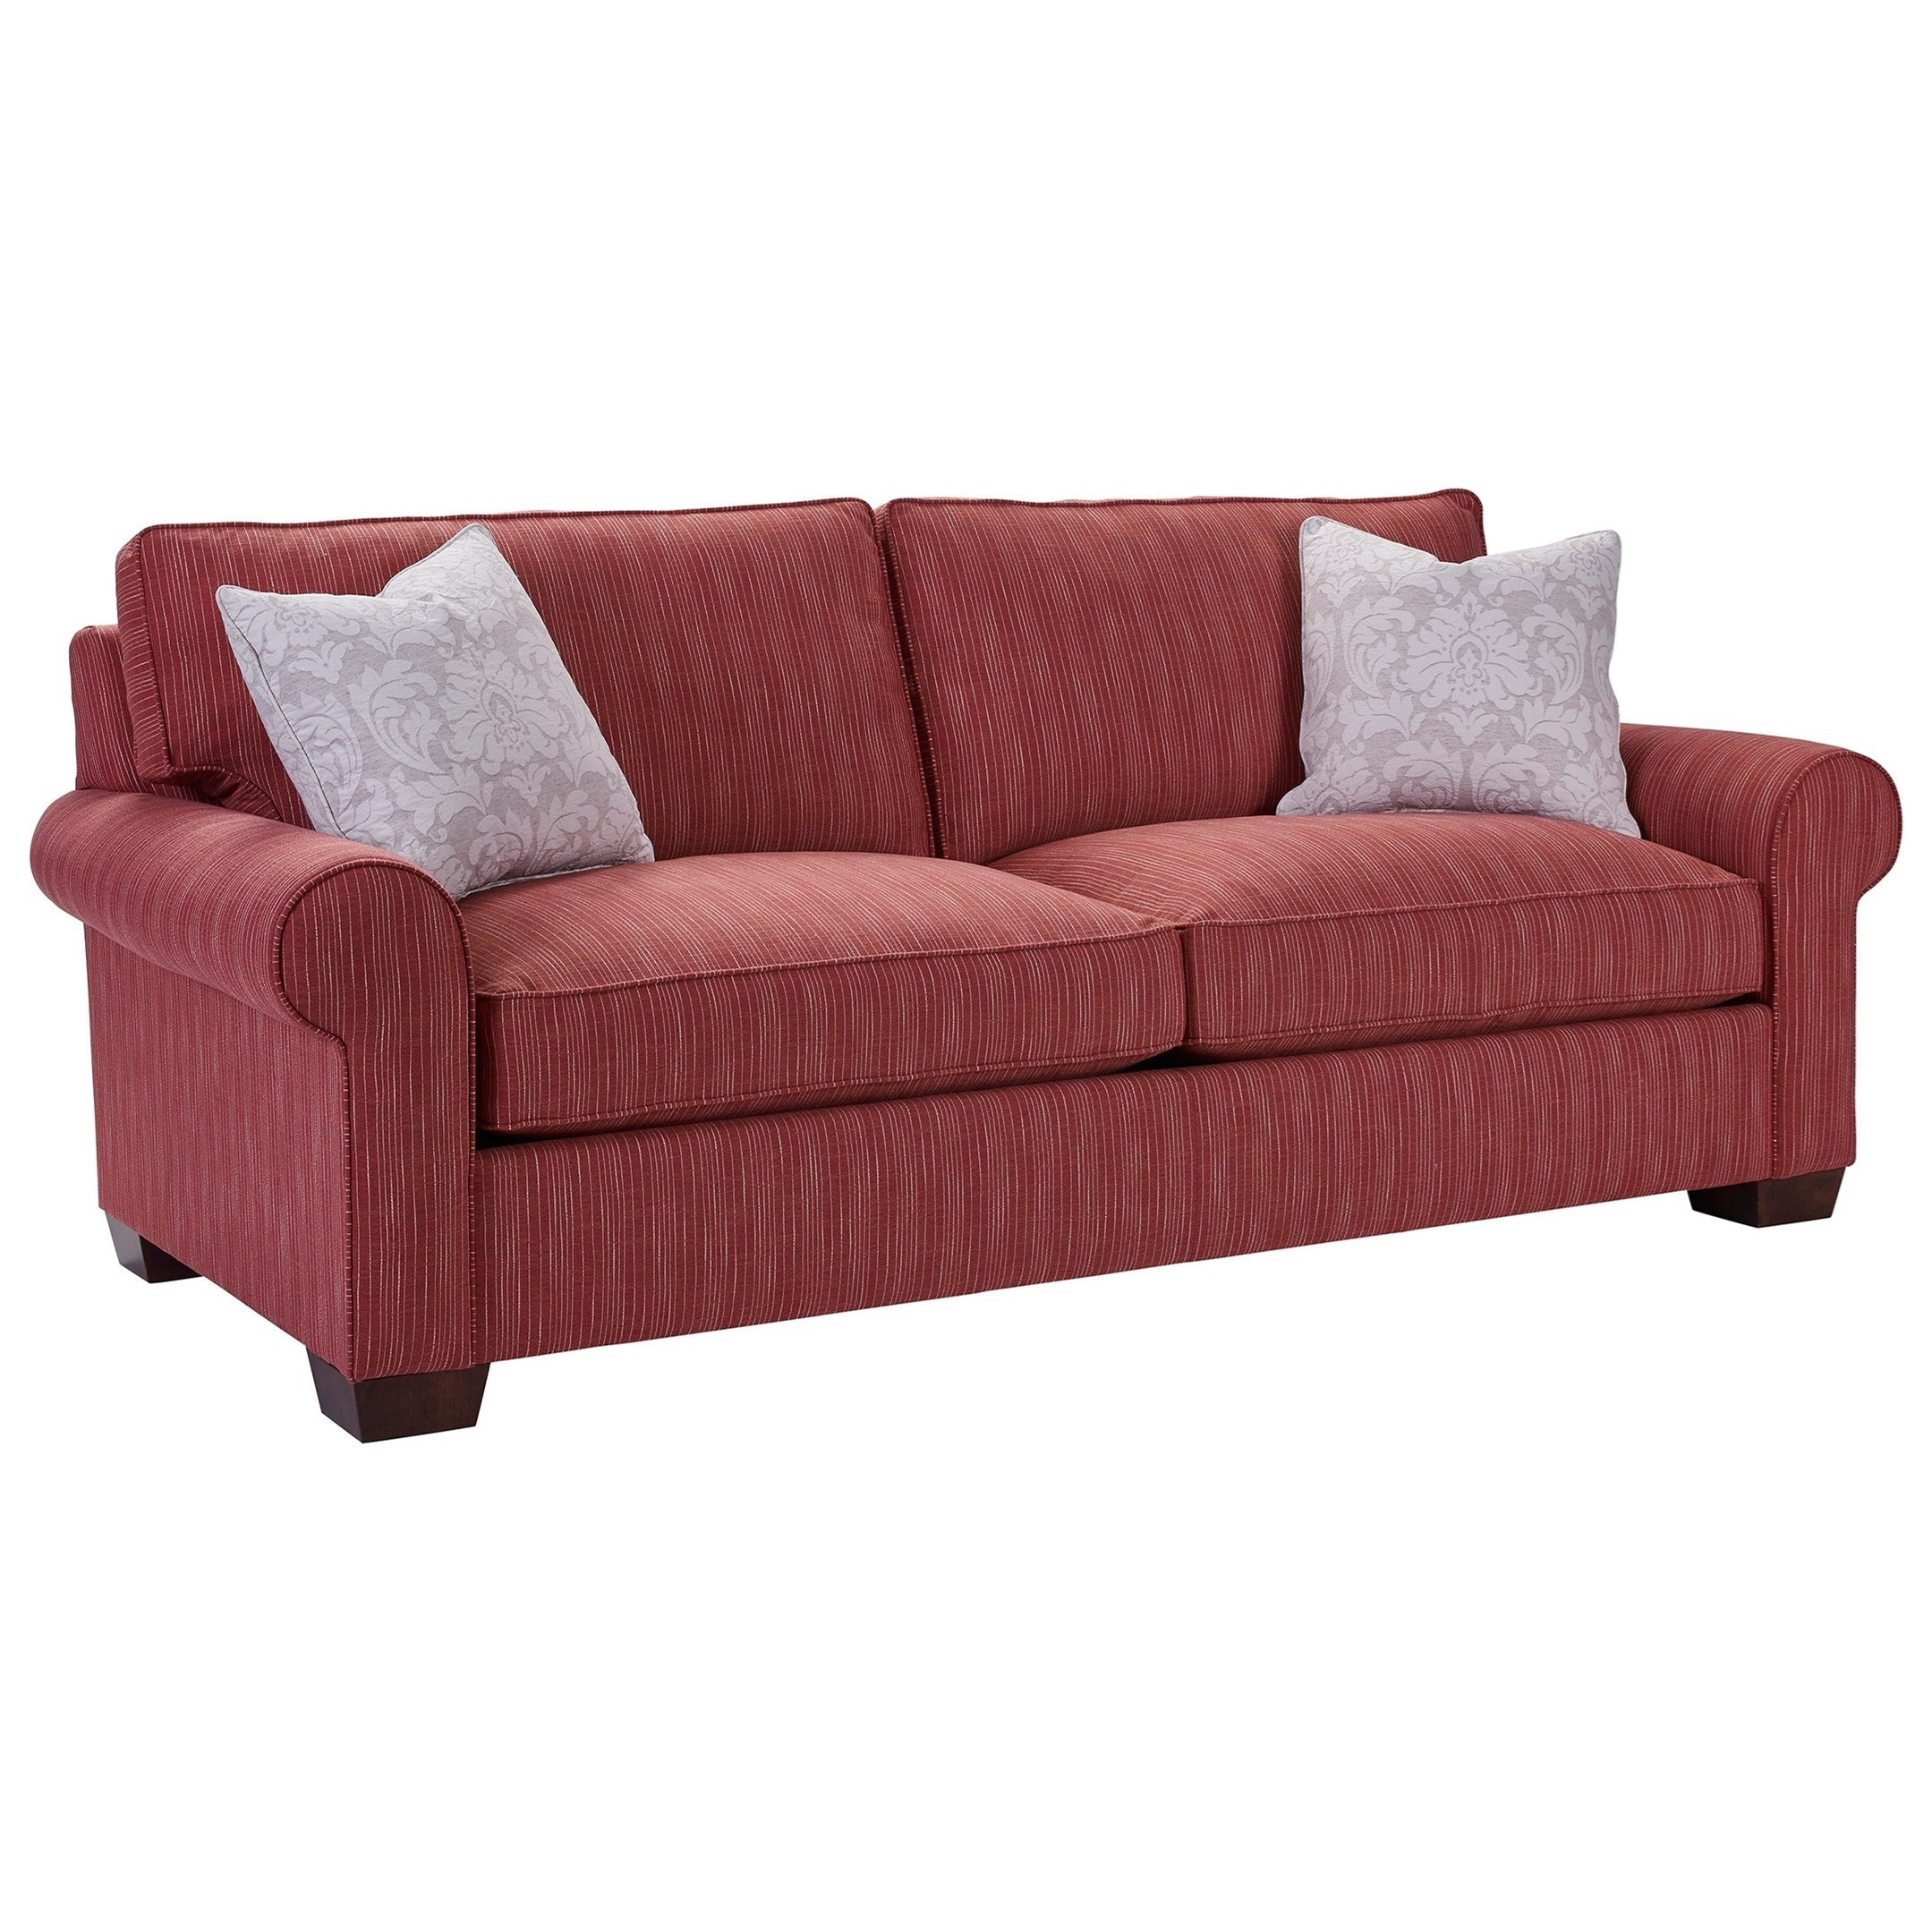 Broyhill Furniture Isadore Apartment Sofa - Item Number: 4272-2-4600-65